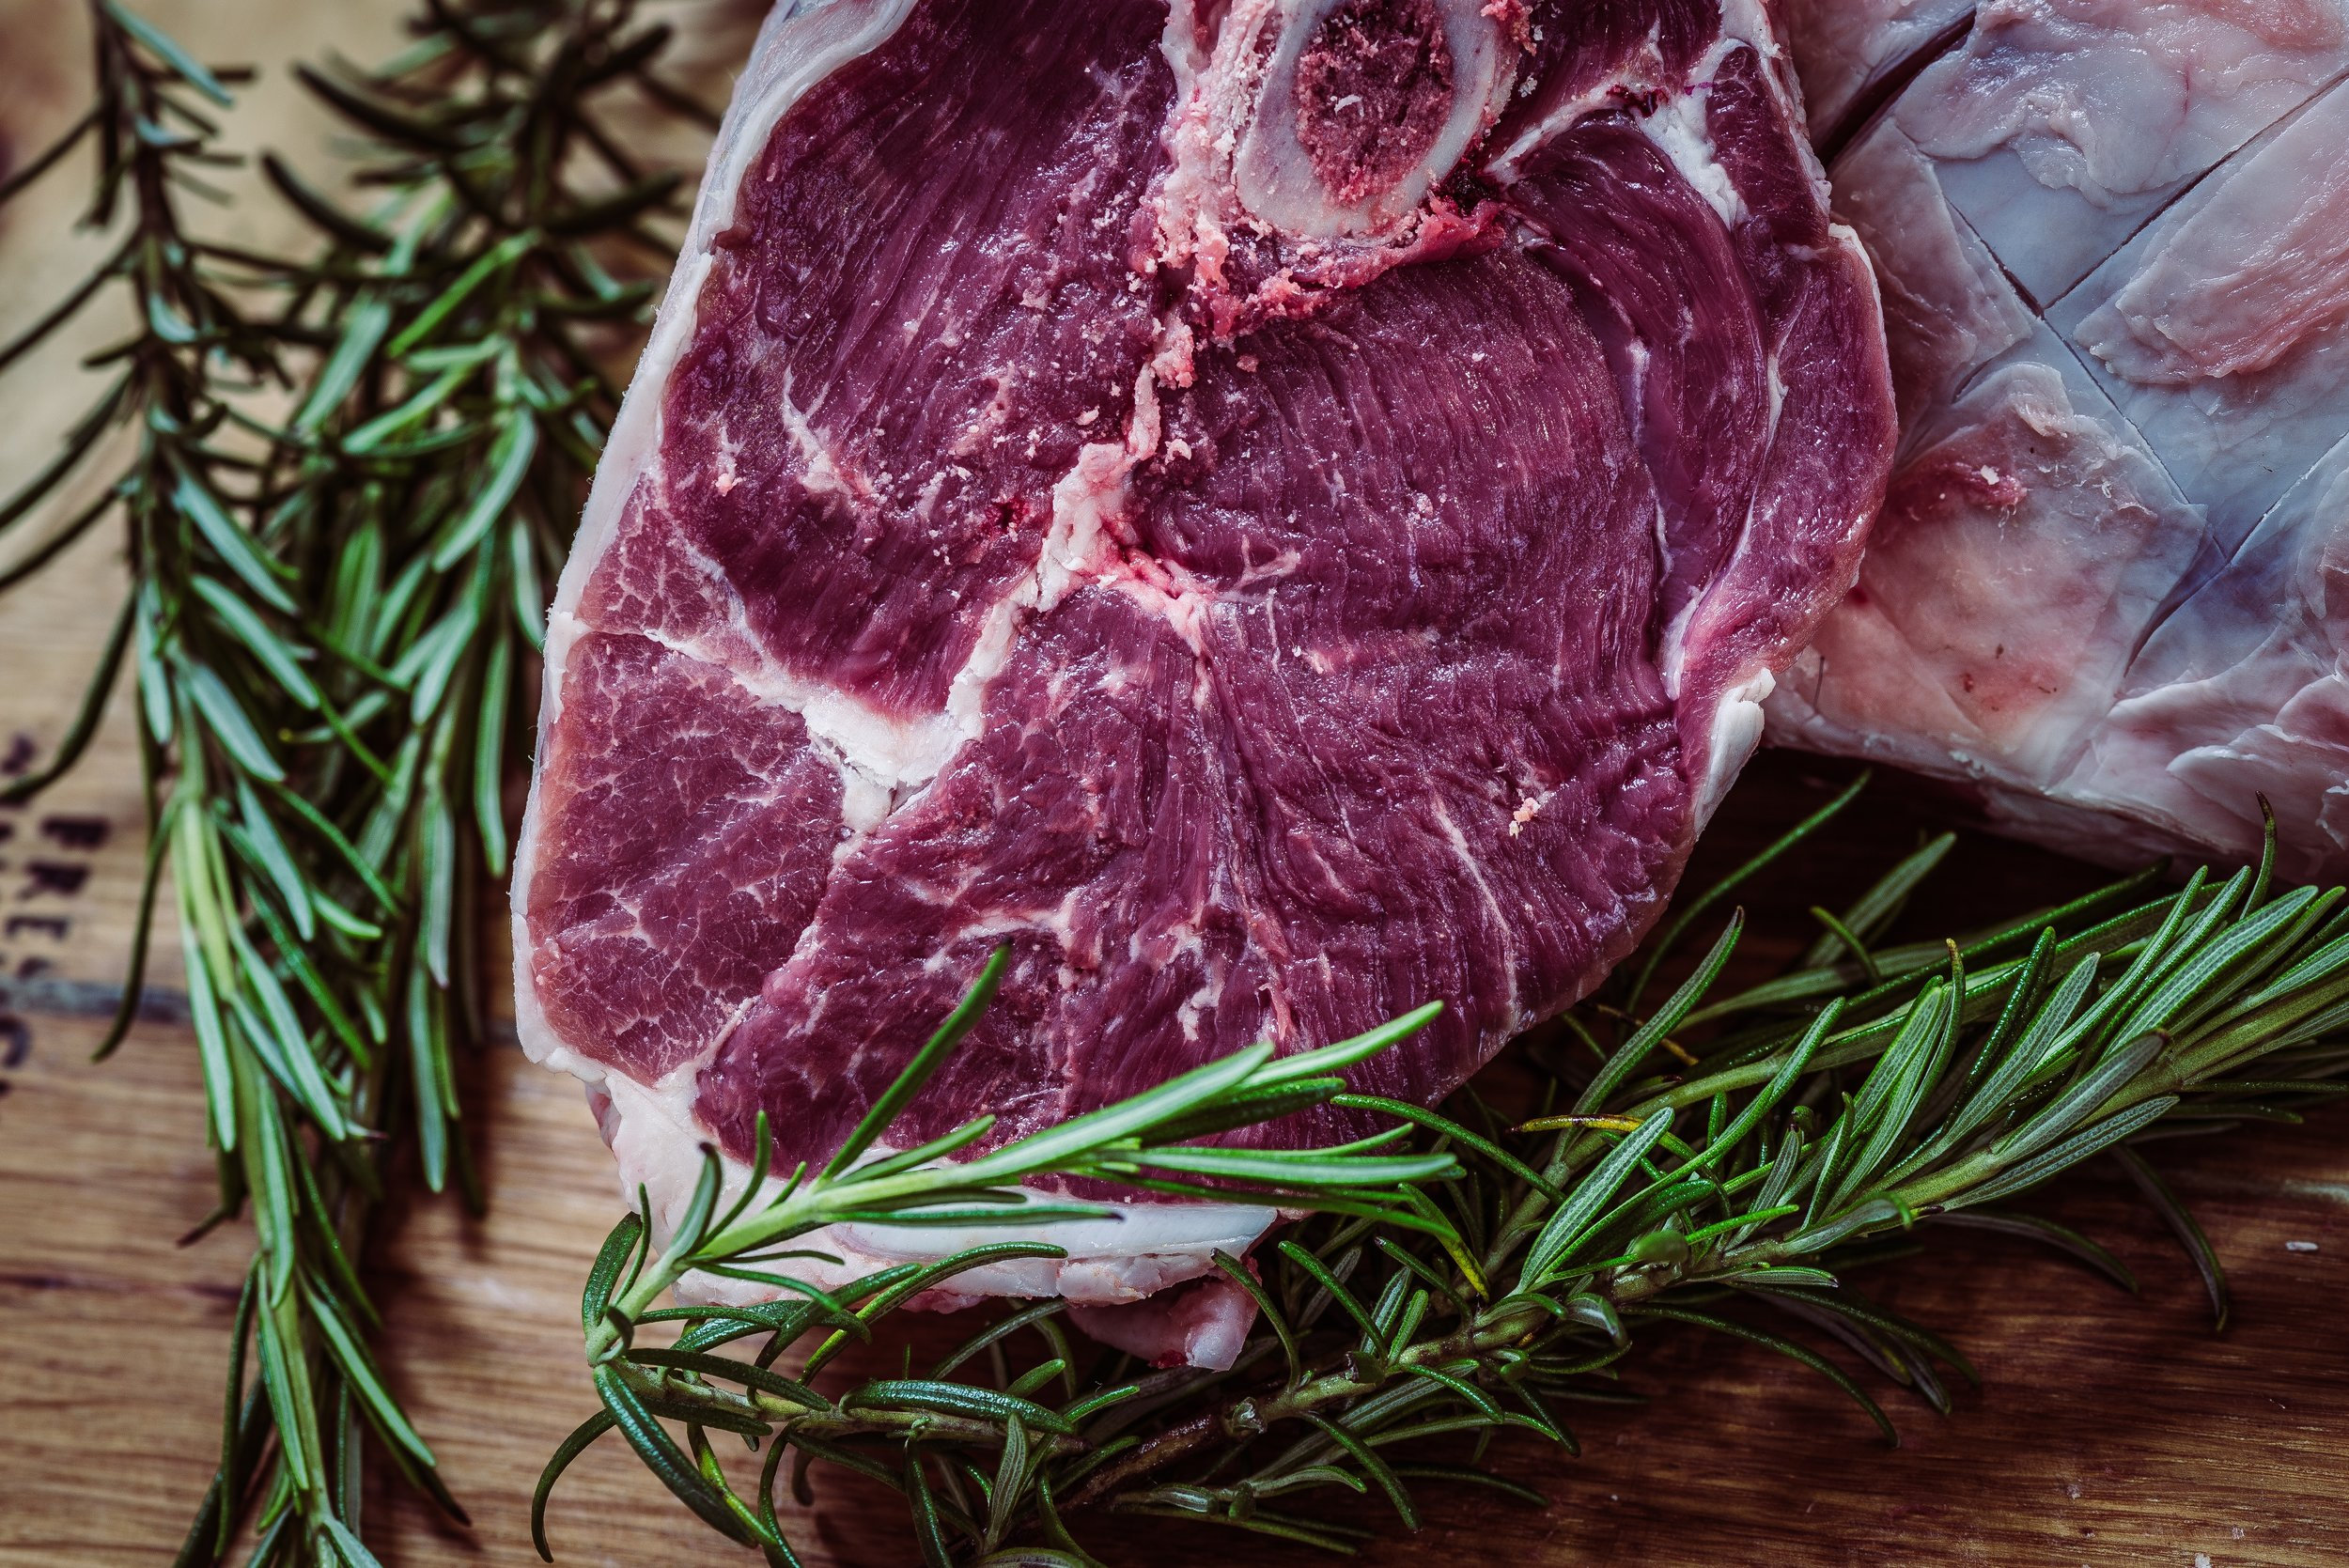 raw meat.jpg